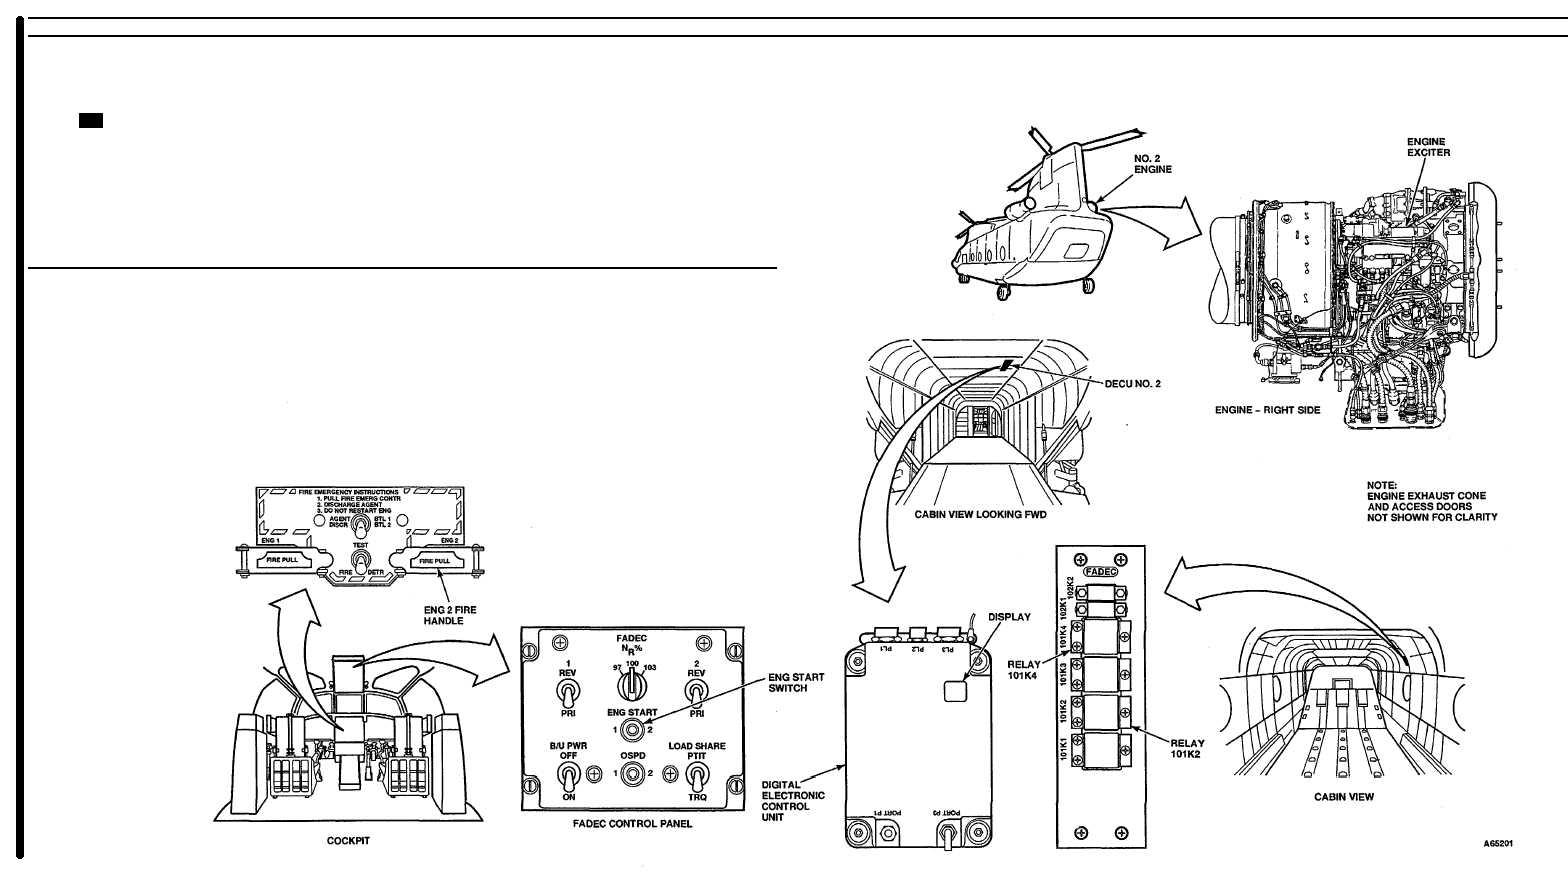 4-10.14 NO. 2 ENGINE DOES NOT START (ENGINE IGNITION